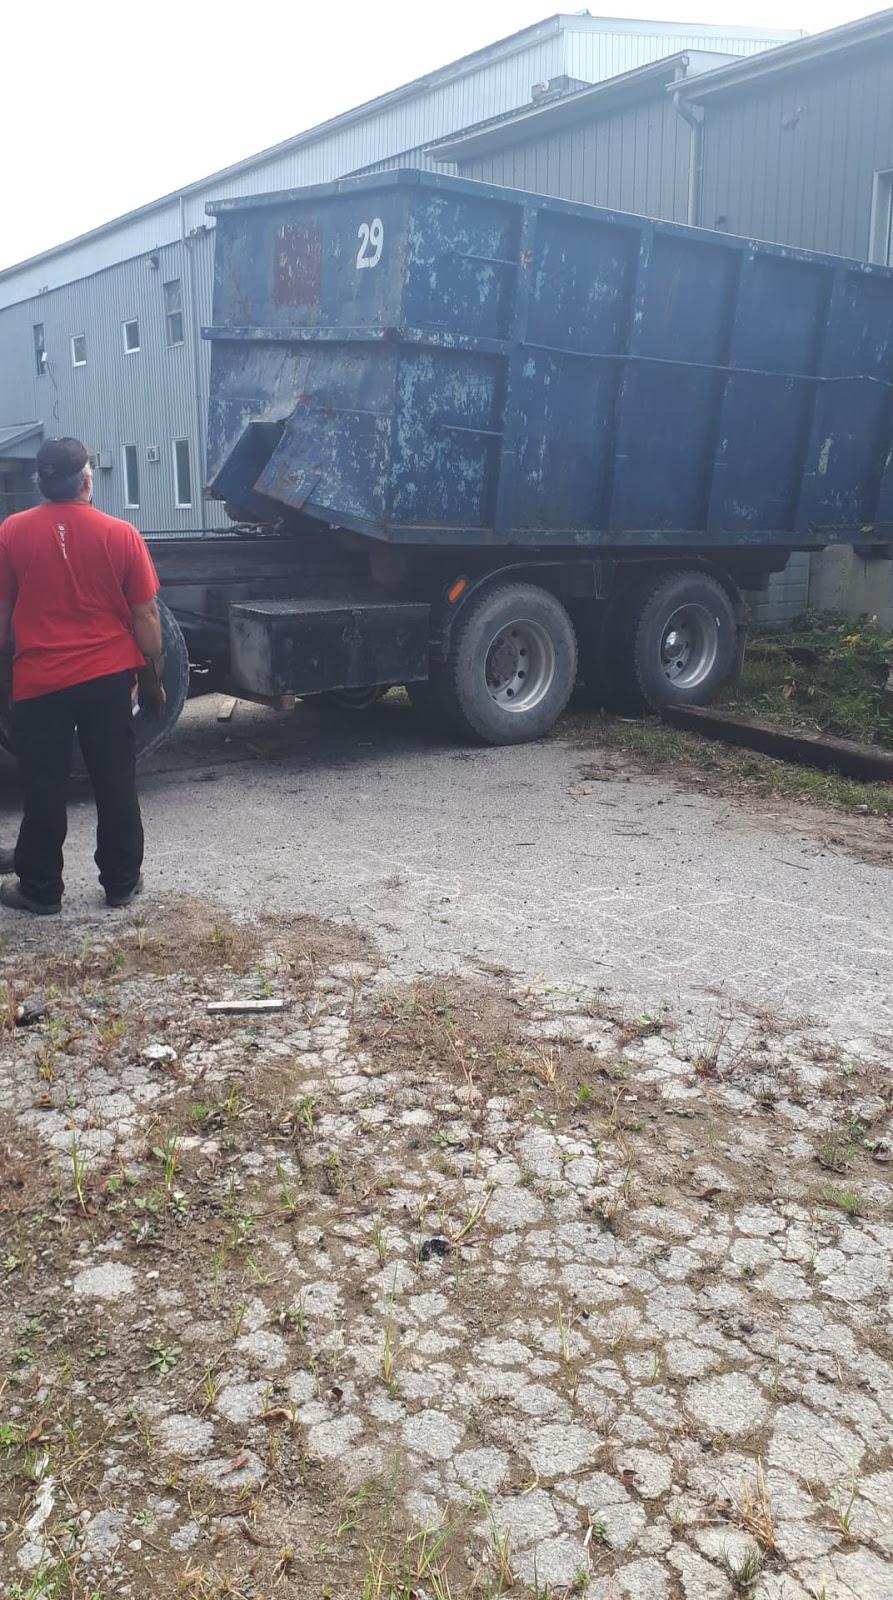 Chadwicks Towing & Repairs Inc. | car repair | 8005 County Road 2, Cobourg, ON K9A 4J7, Canada | 9053725922 OR +1 905-372-5922